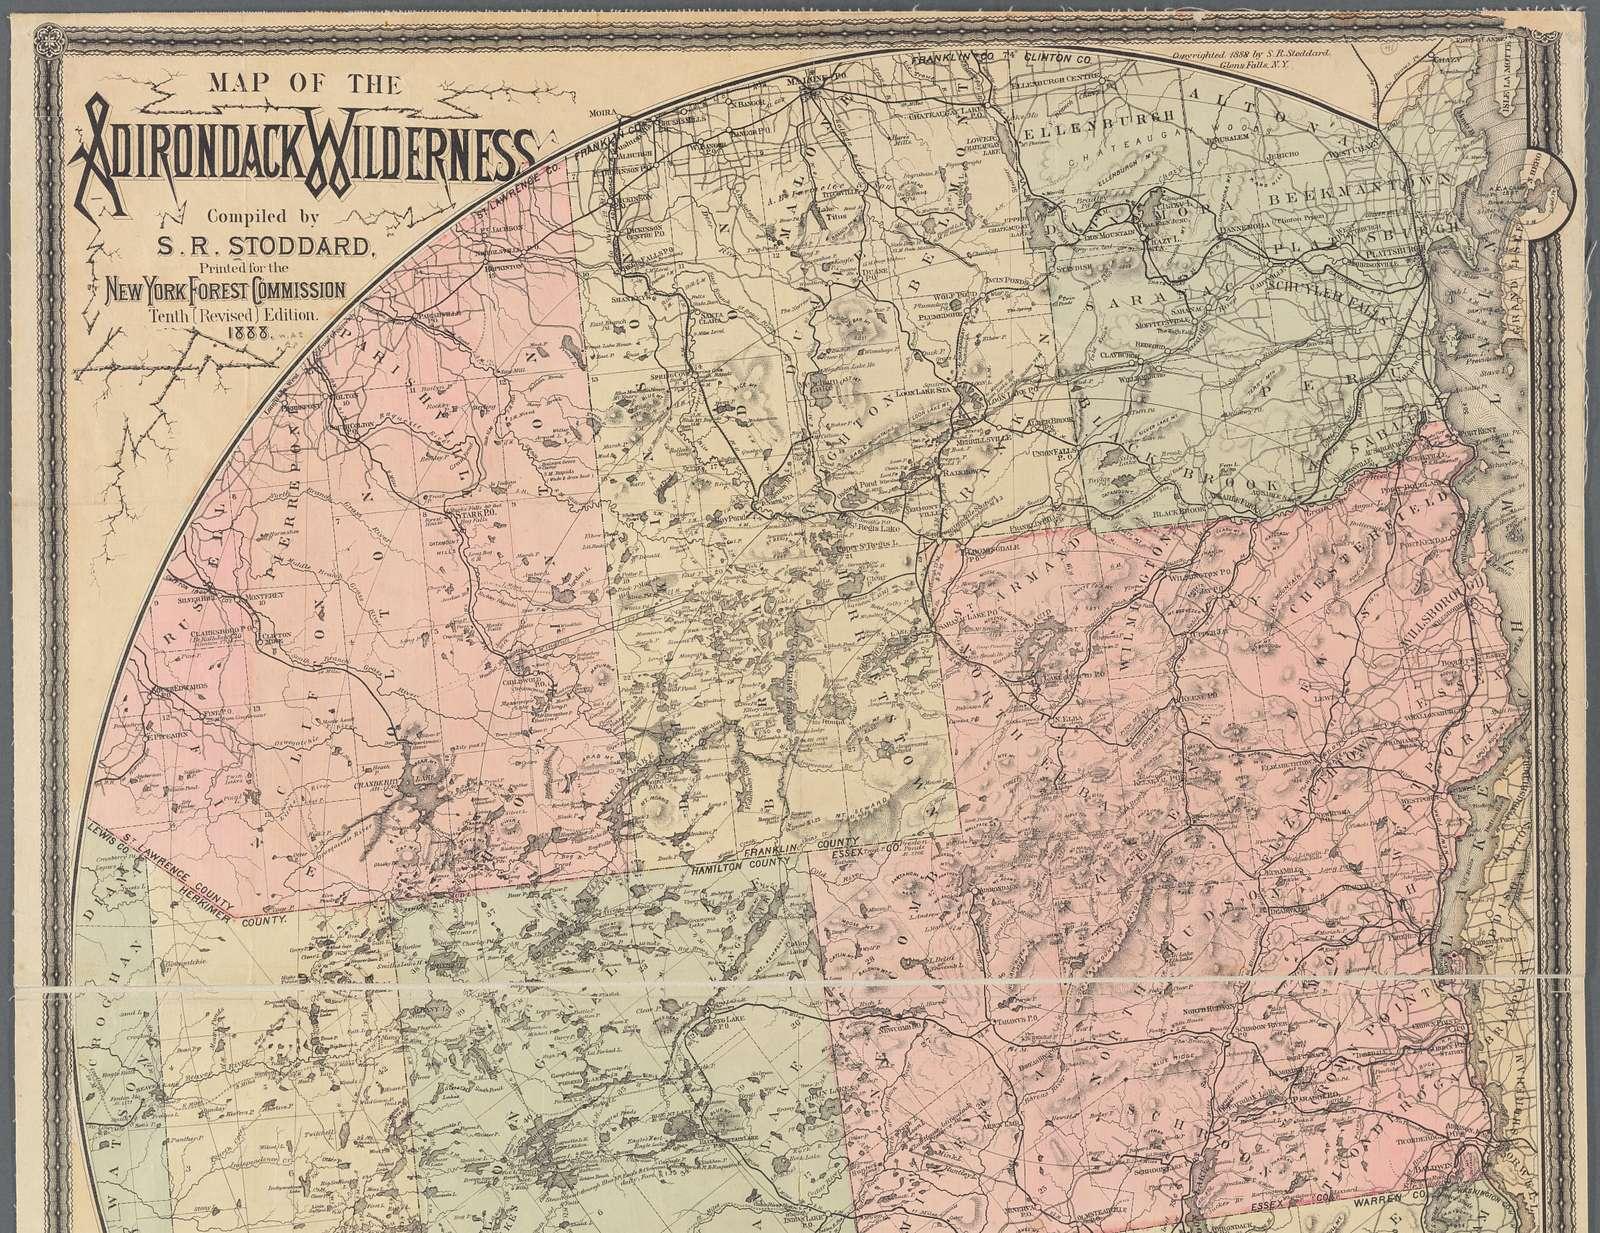 Map of the Adirondack wilderness